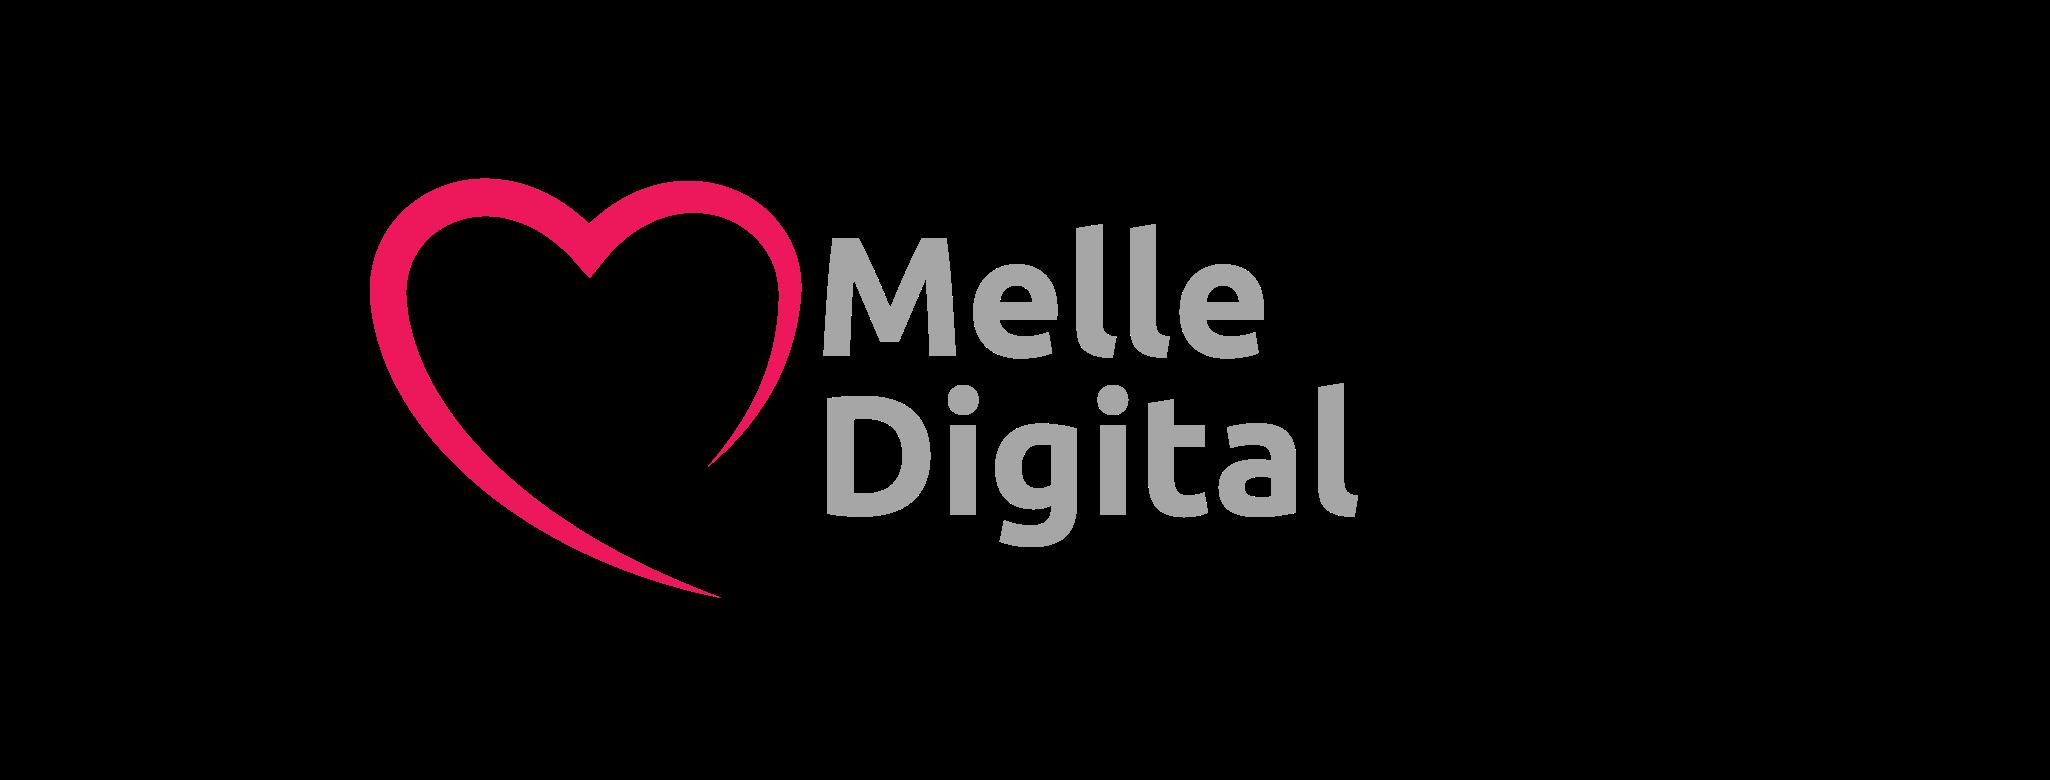 Melle Digital